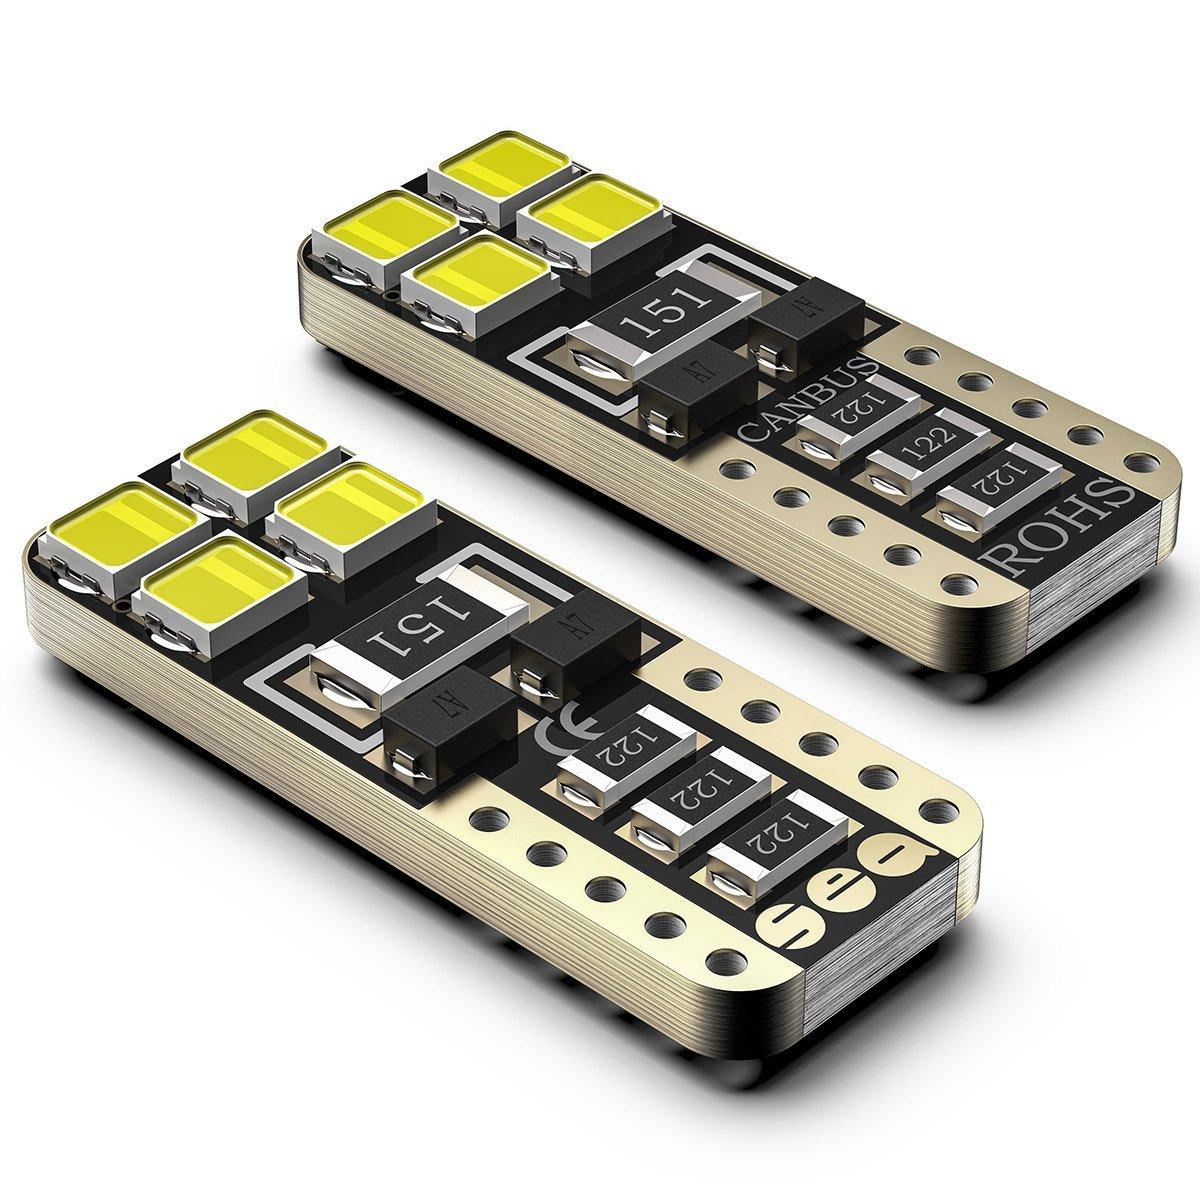 Bombillas LED Coche T10 W5W 6000K SEALIGHT 8 SMD Canbus LED 555 501 558 2825 175 192 168 194 Y Más Wedge Lampara para coches sin polaridad xenón 12V de ...